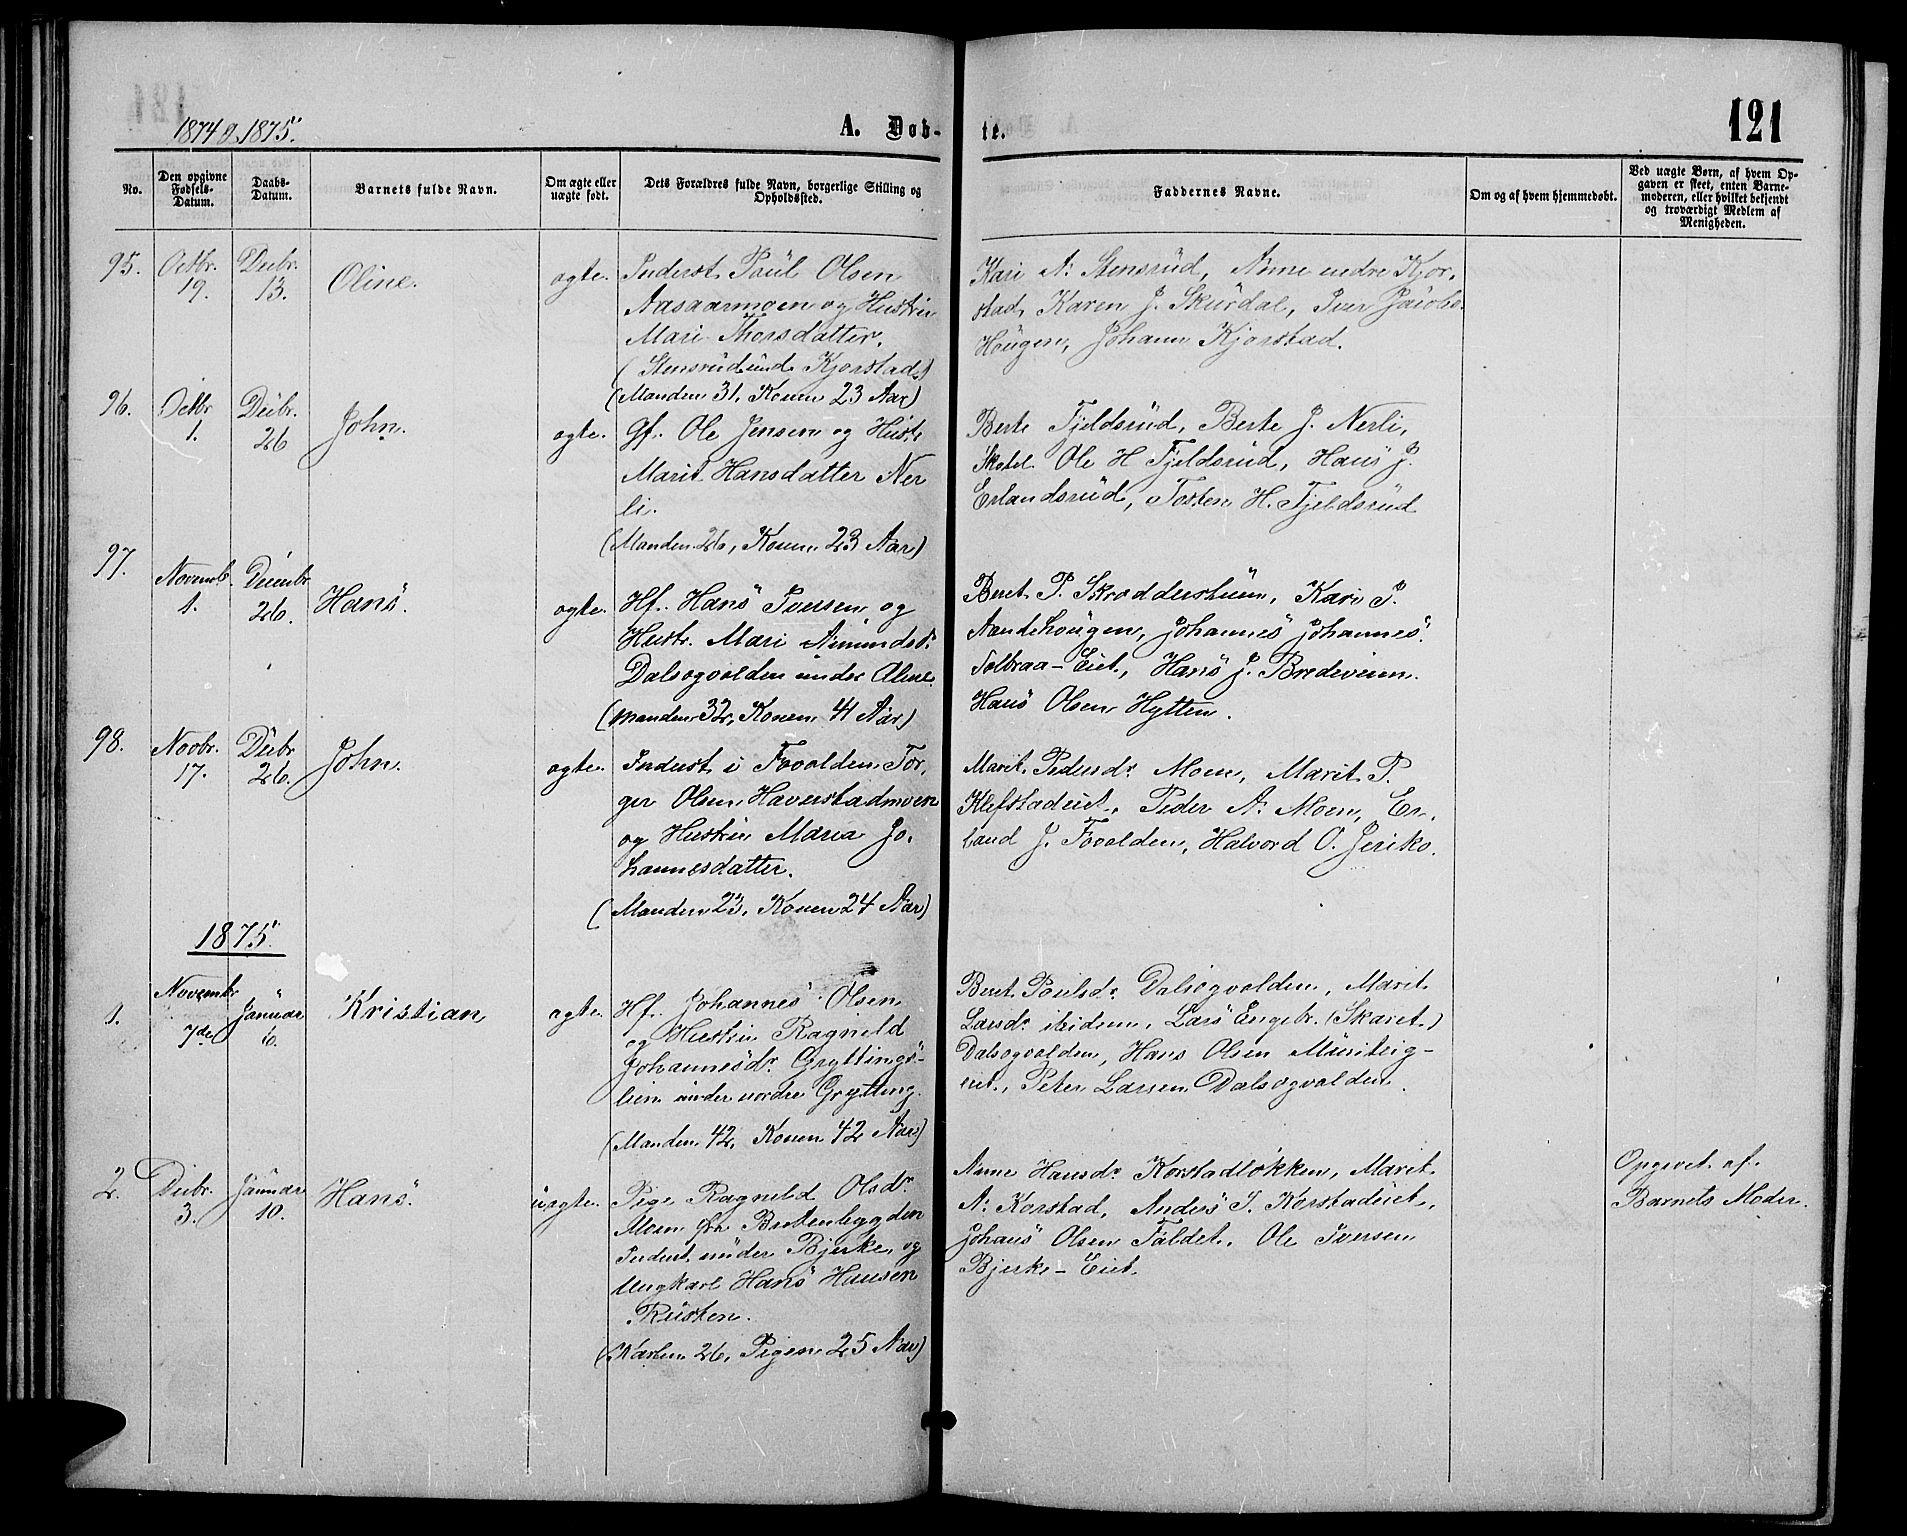 SAH, Sør-Fron prestekontor, H/Ha/Hab/L0002: Klokkerbok nr. 2, 1864-1883, s. 121